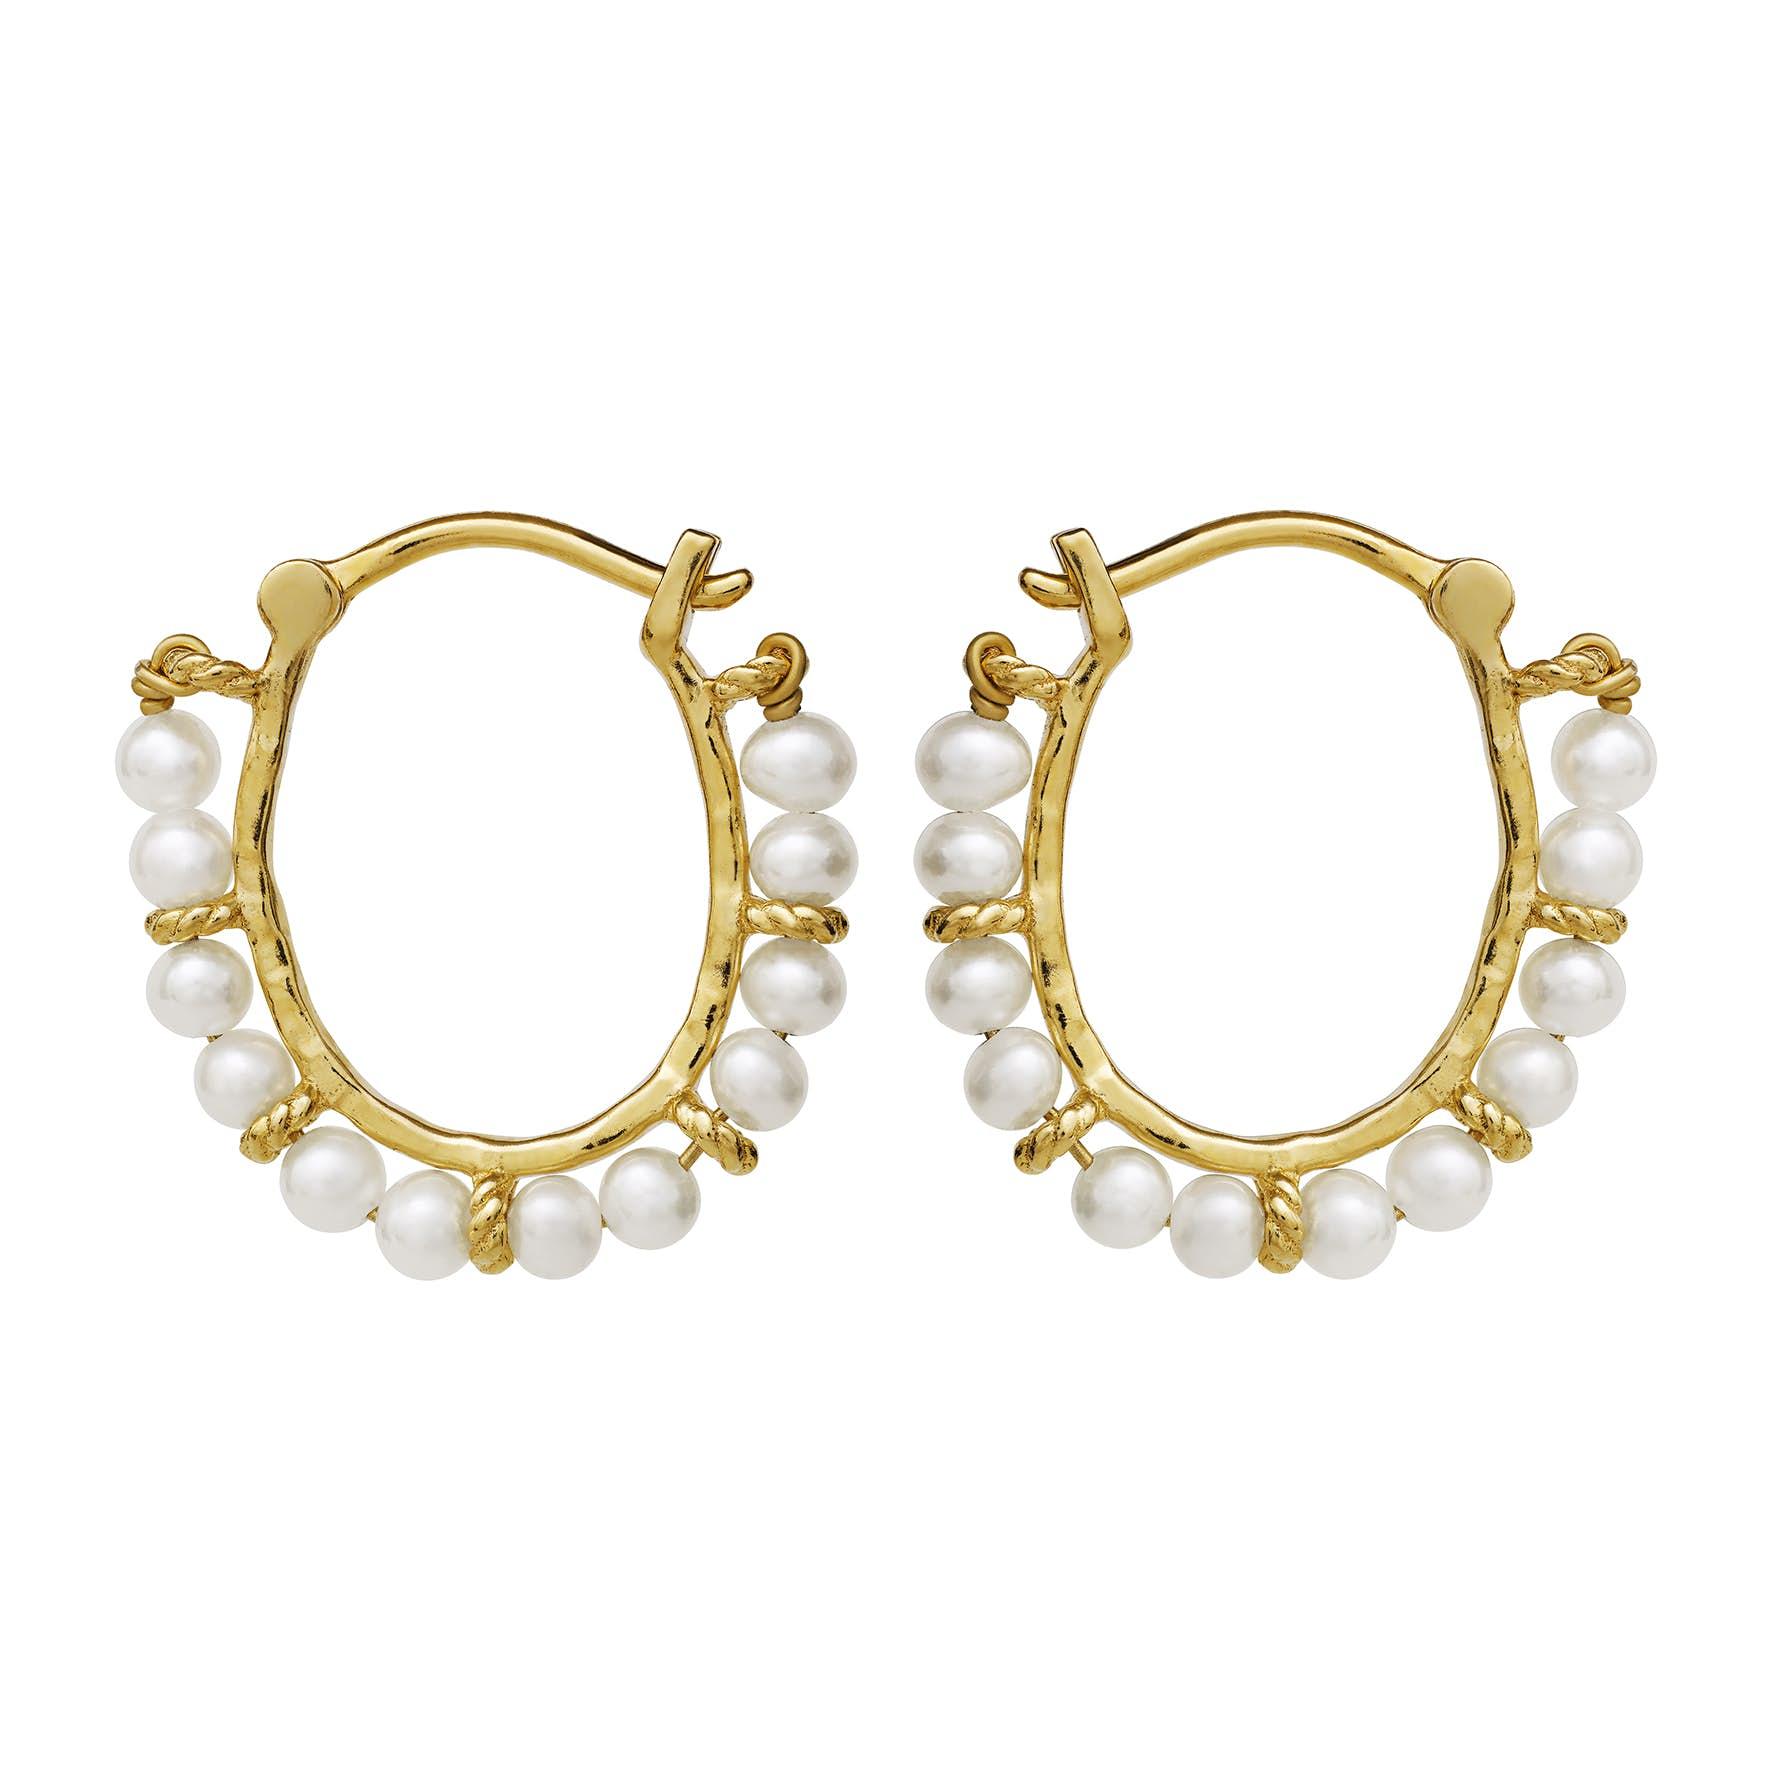 Phile Earrings von Maanesten in Vergoldet-Silber Sterling 925 Freshwater Pearl Blank